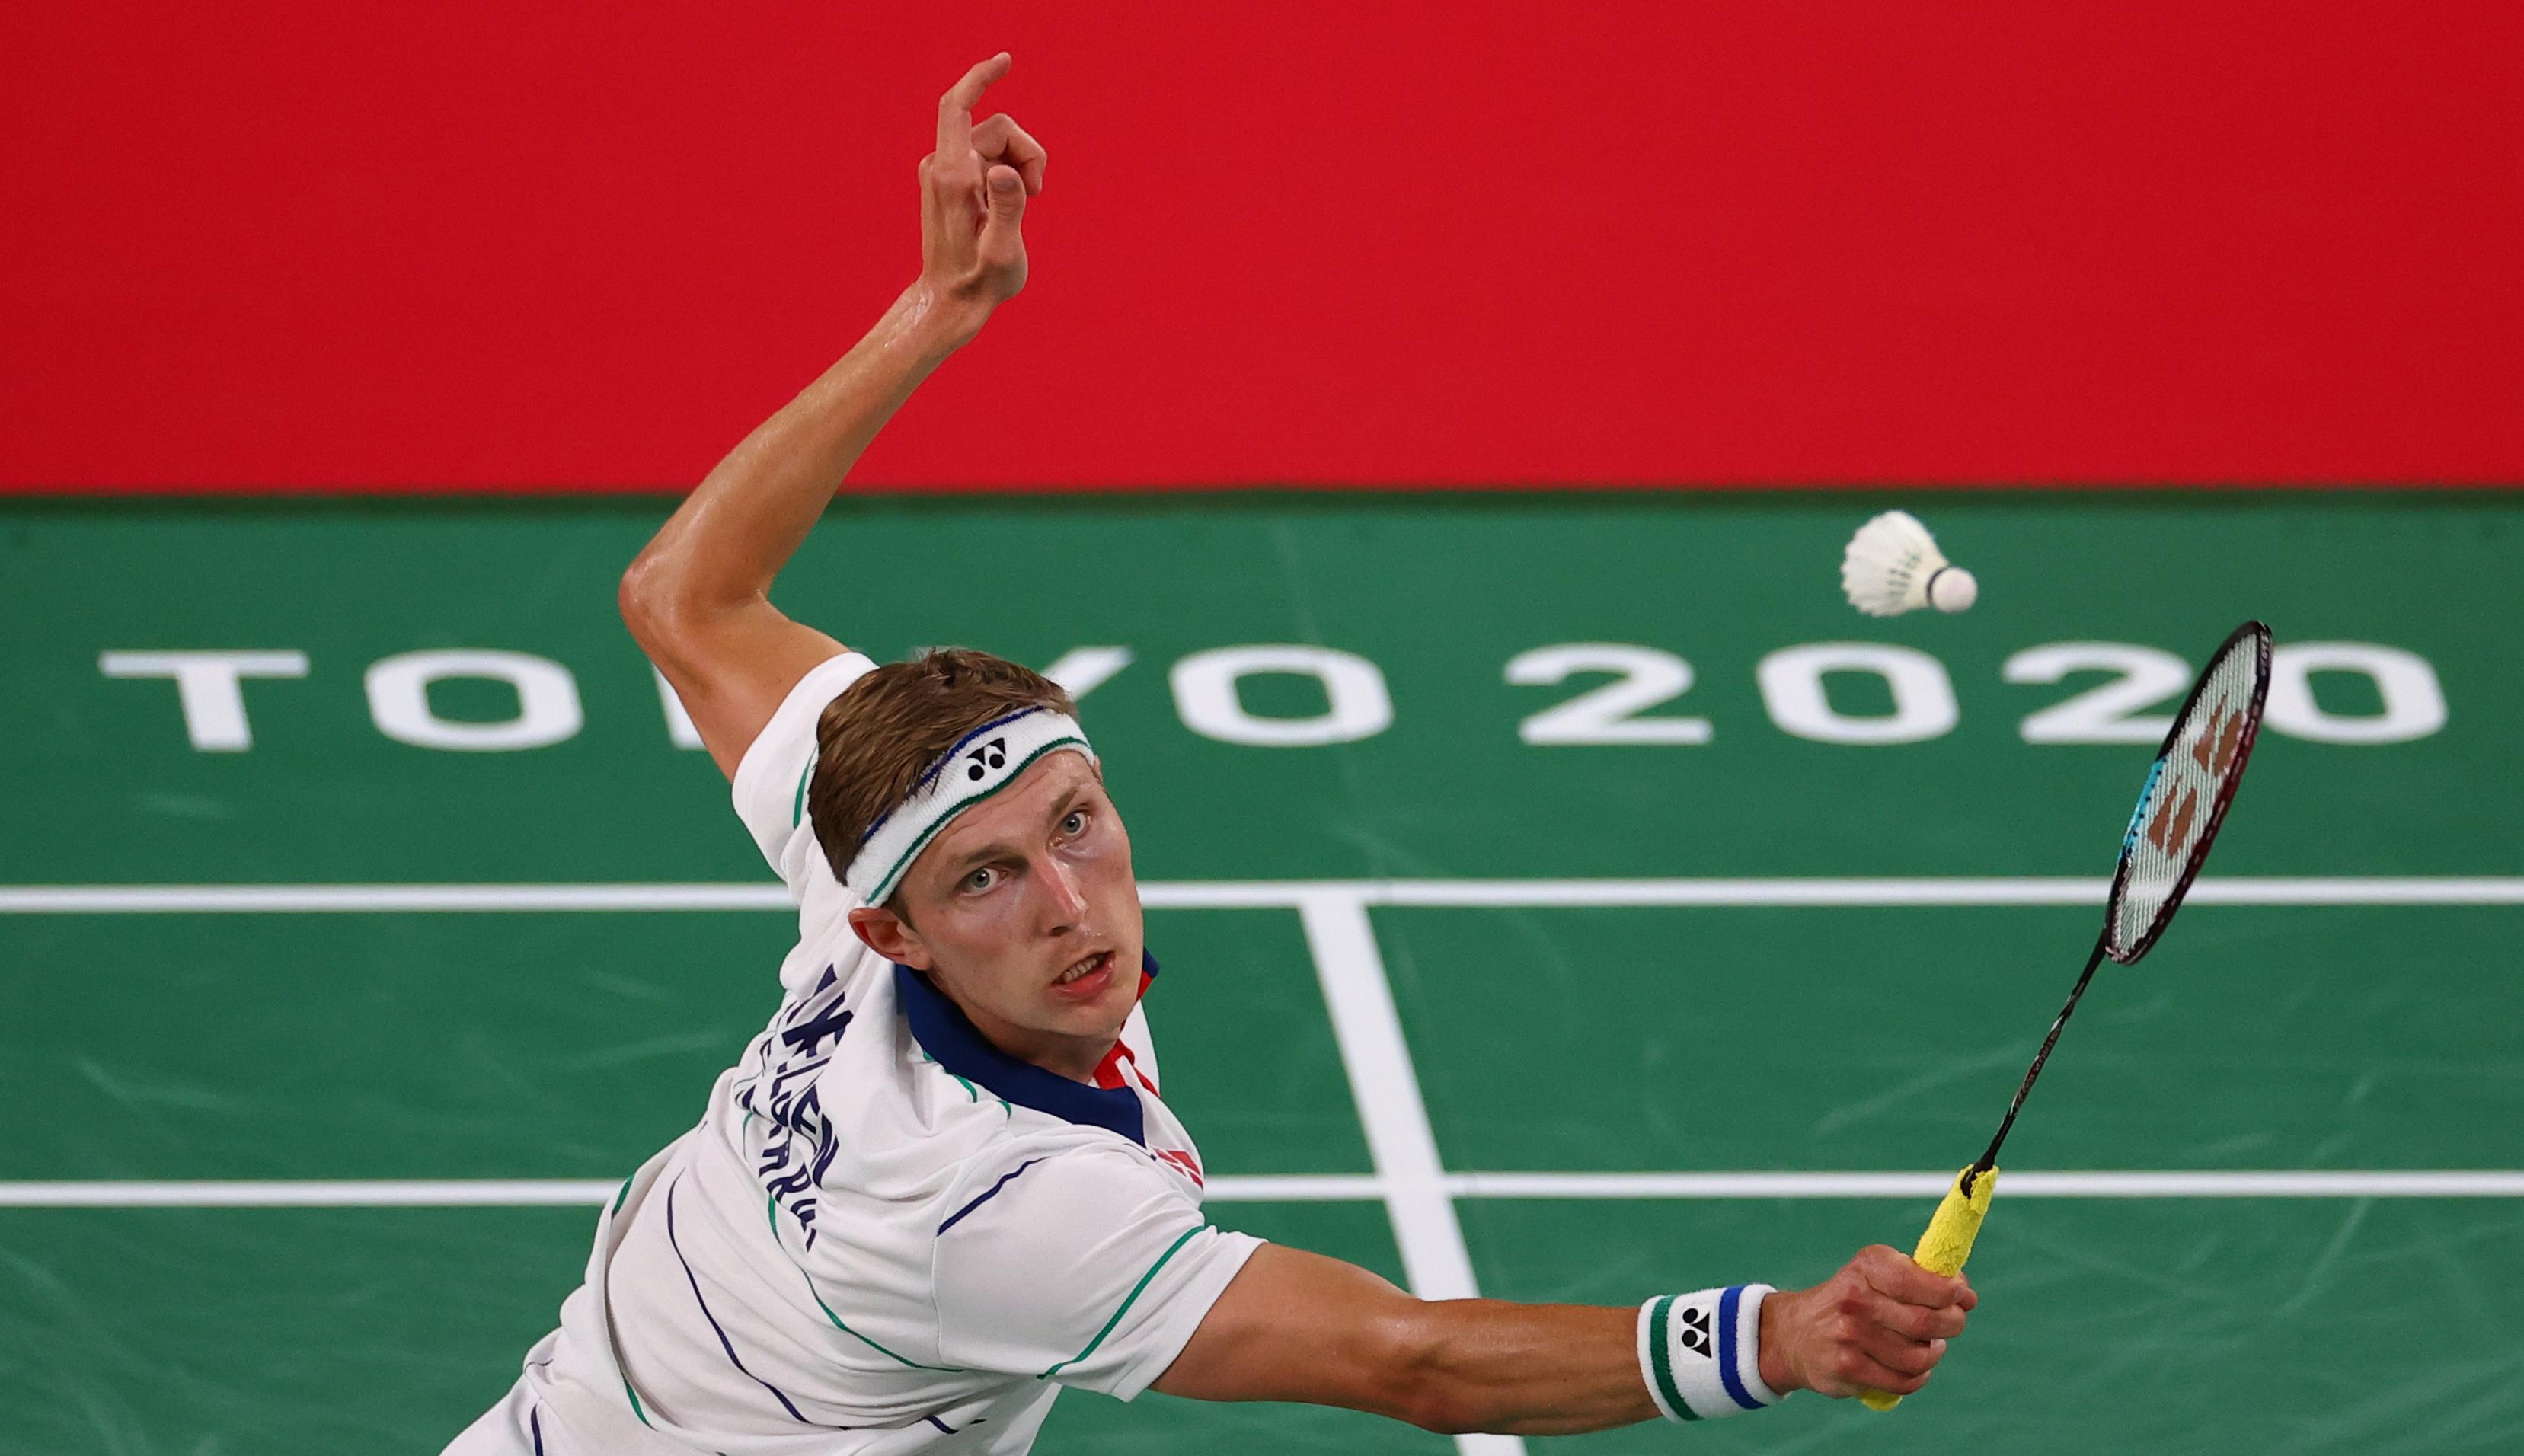 Tokyo 2020 Olympics - Badminton - Men's Singles - Group Stage - MFS - Musashino Forest Sport Plaza, Tokyo, Japan - July 24, 2021. Viktor Axelsen of Denmark in action during the match against Luka Wraber of Austria. REUTERS/Leonhard Foeger